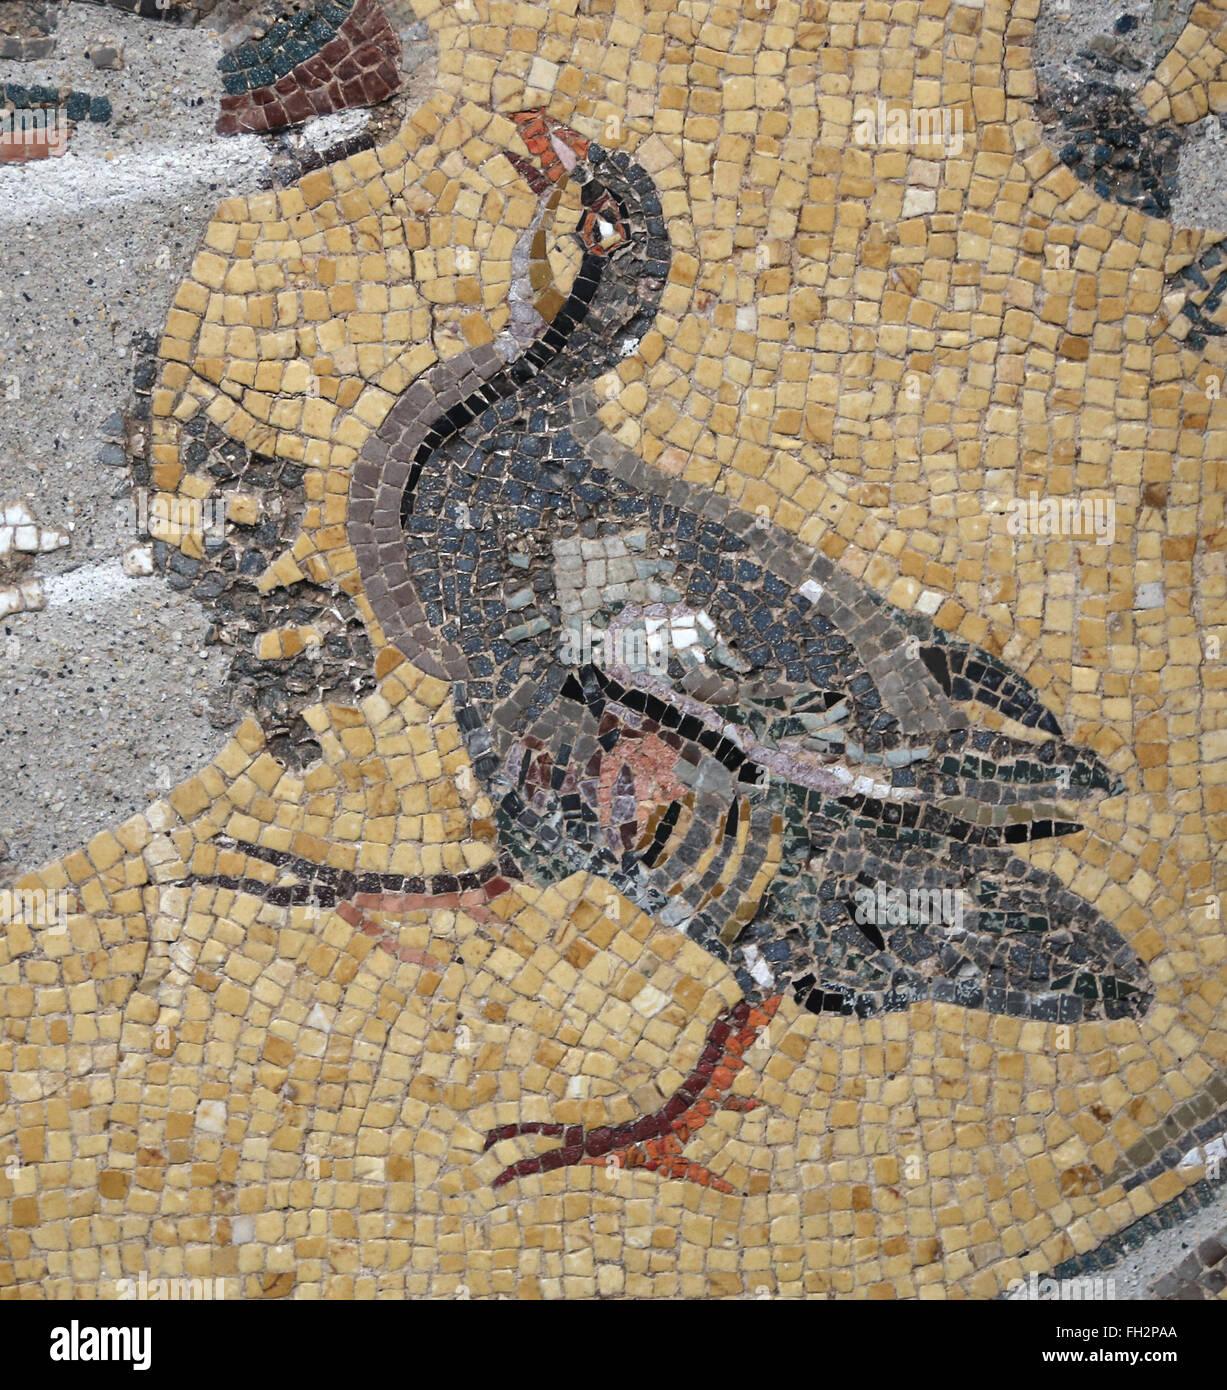 Birds around a vase. Daphne, suburb of Antioch, Turkey. 3rd century AD. Louvre Museum. Paris. France. - Stock Image